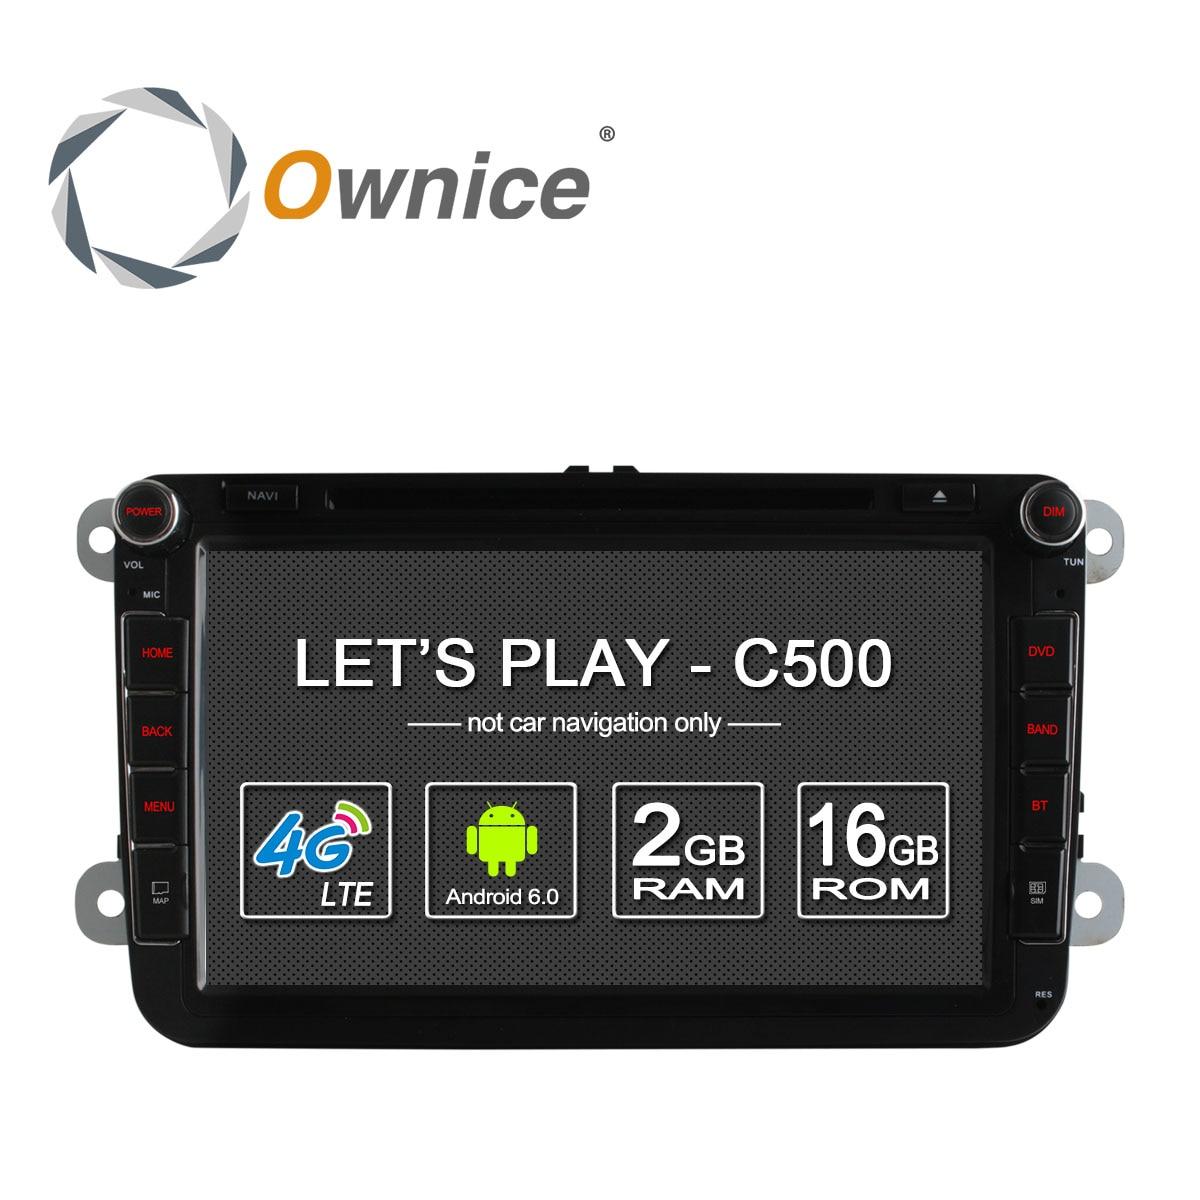 4G SIM LTE Nerwork Ownice C500 1024*600 Android 6.0 2G RAM 2 Din Car DVD GPS Navi Radio Player For VW Skoda Octavia 2 joyous 8 hd capacitive android 4 2 stereo car dvd player w gps navi for vw passat seat skoda